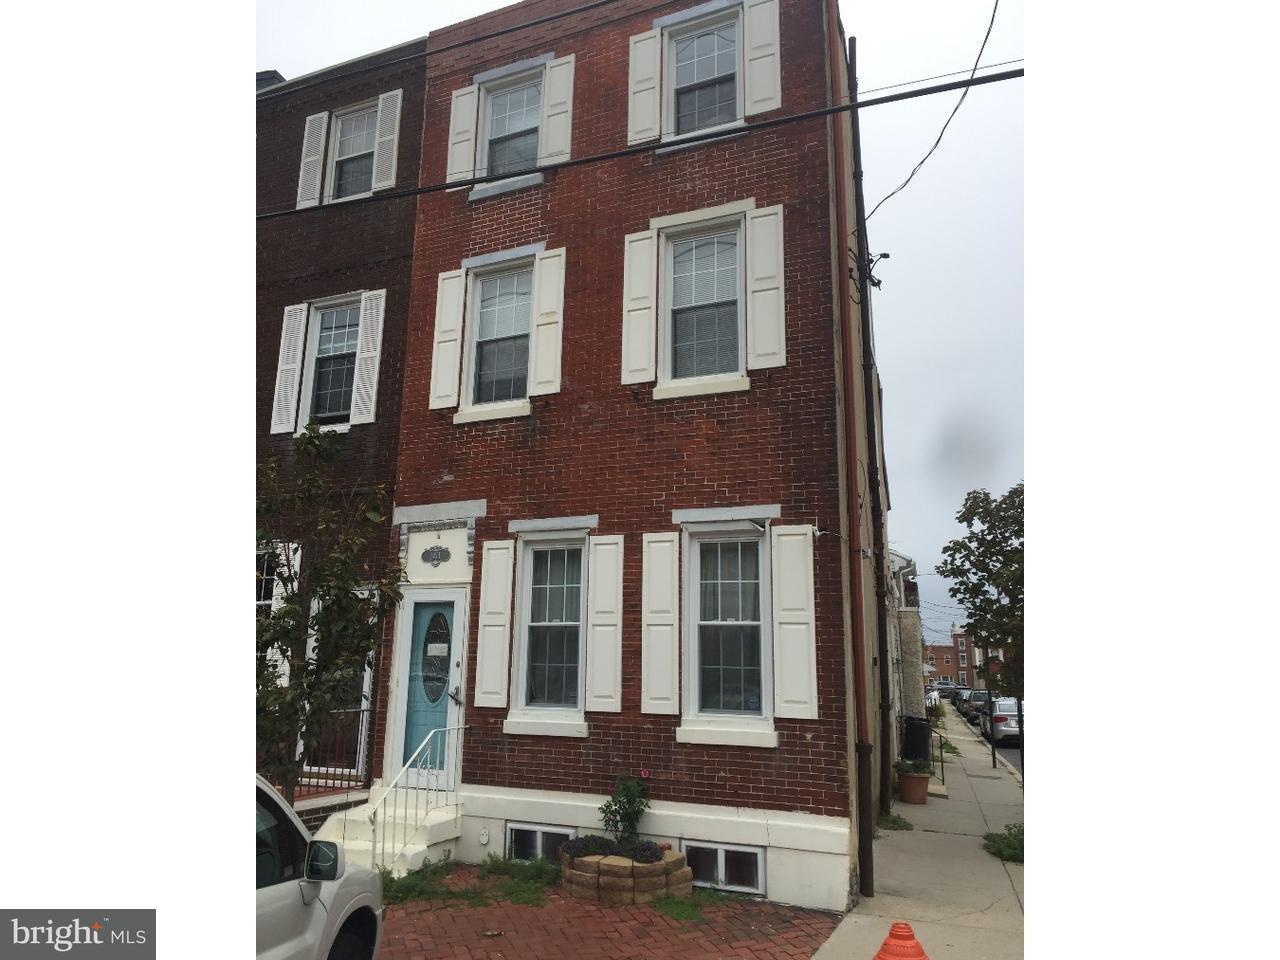 1411 E Moyamensing Philadelphia, PA 19147